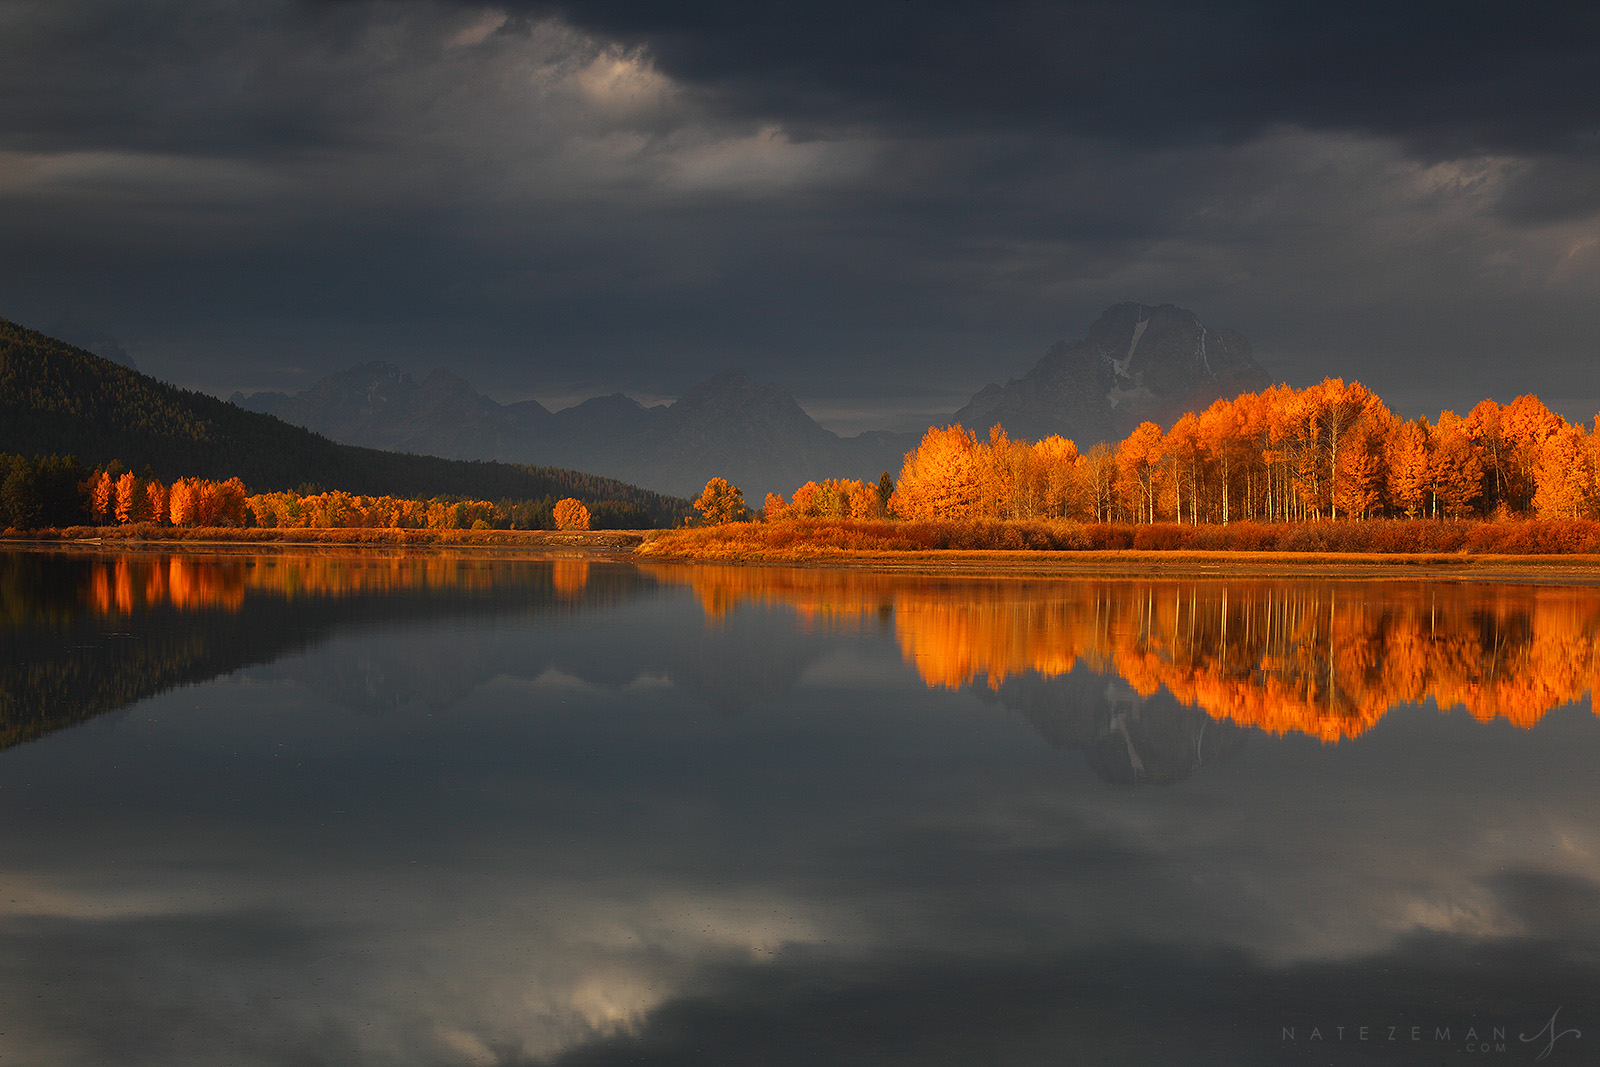 mt moran, thomas moran, moran, grand teton national park, tetons, oxbow bend, fall, autumn, yellowstone, sunrise, photo